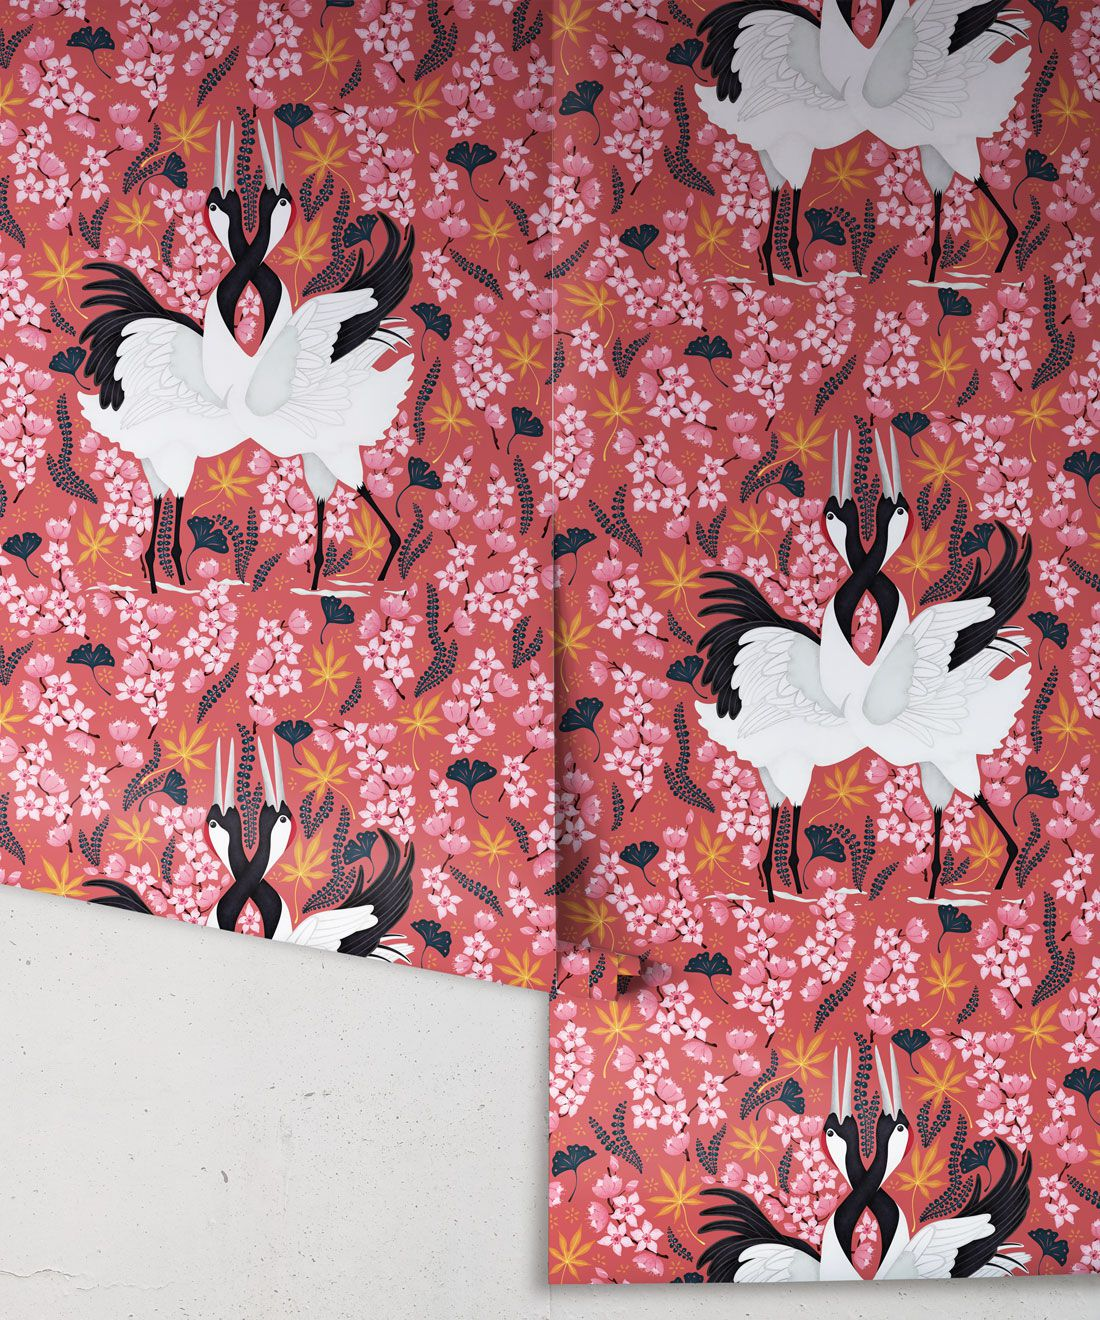 Japanese Cranes Wallpaper • Bird Wallpaper • Red Wallpaper Drops